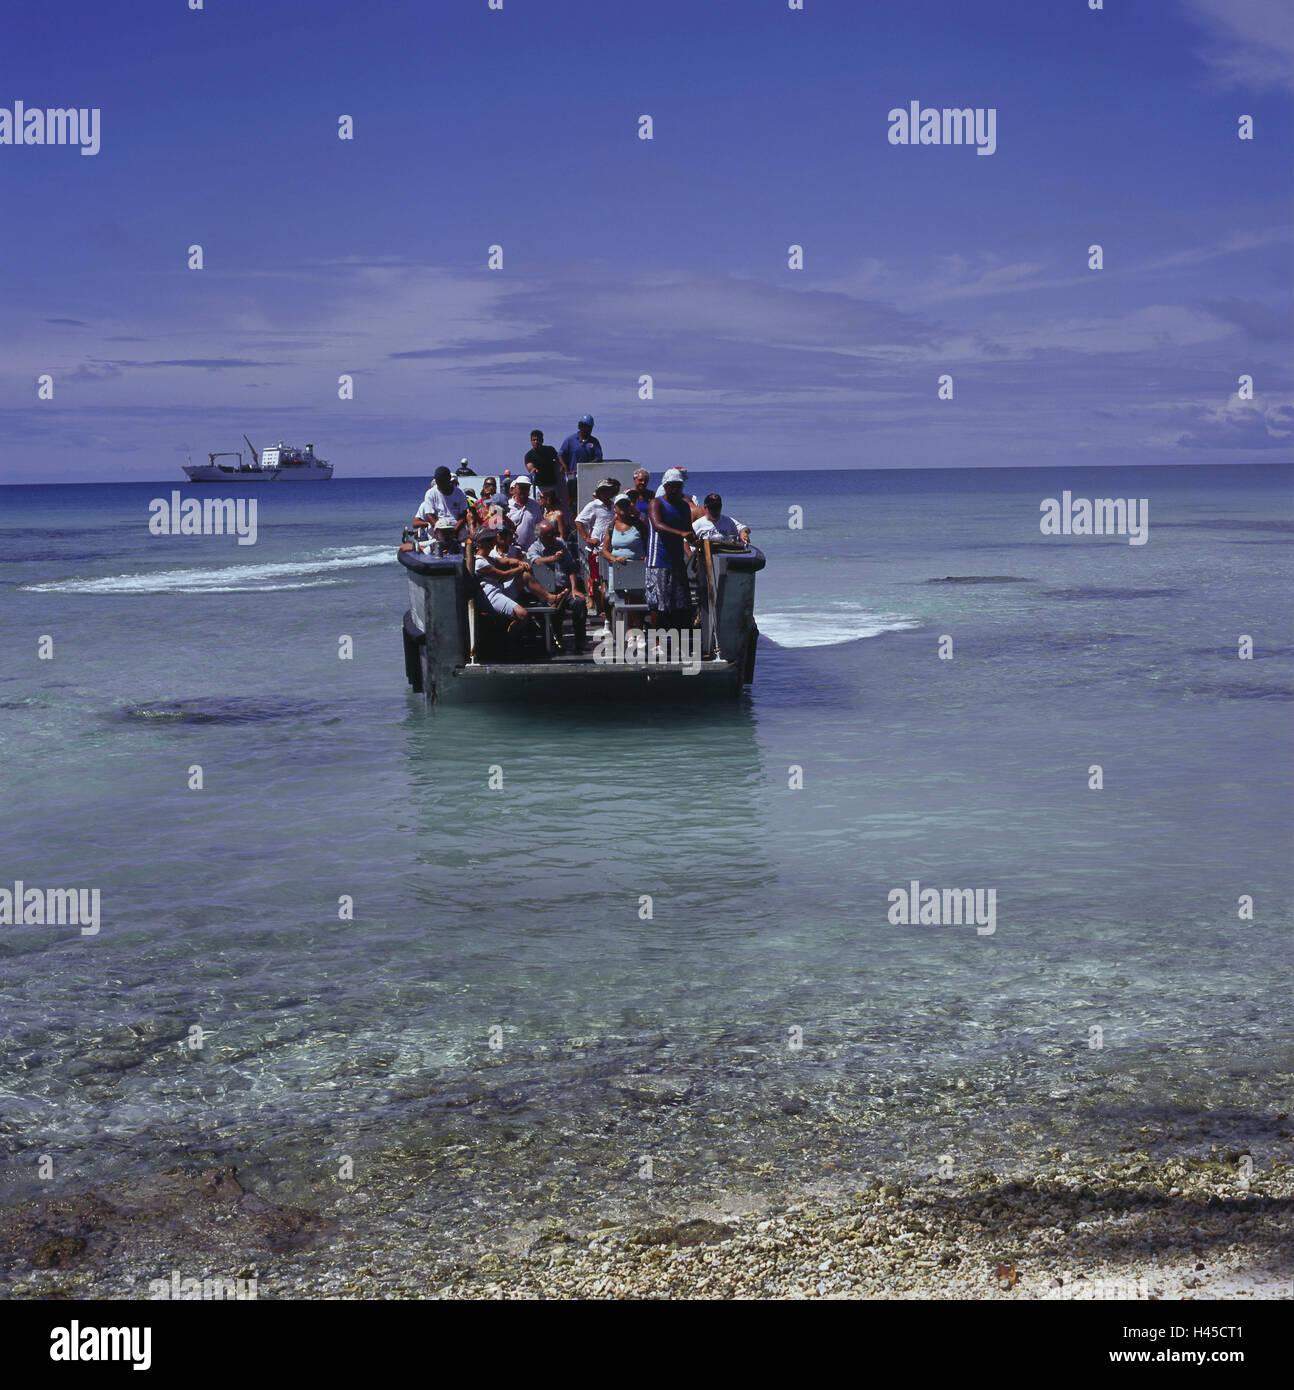 French Polynesia, Rangiroa, sea, tourist boat, the Pacific, coast, beach, ship, boat, person, tourist, boat tour, - Stock Image